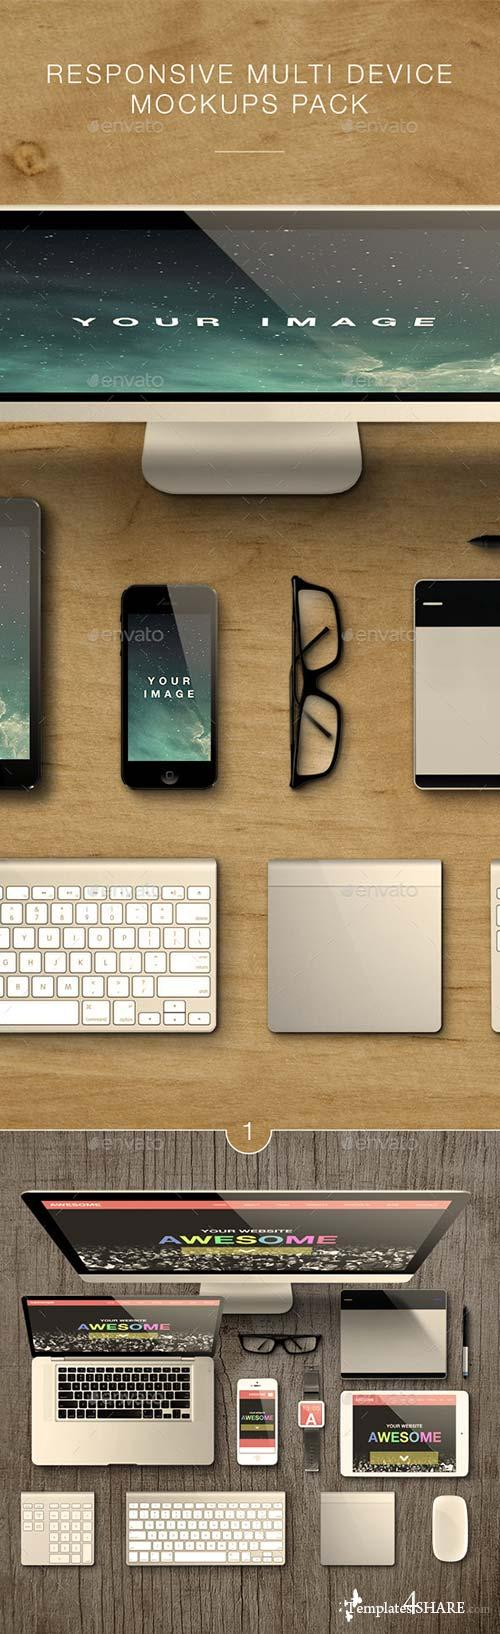 GraphicRiver Responsive Multi Device Mockups Pack